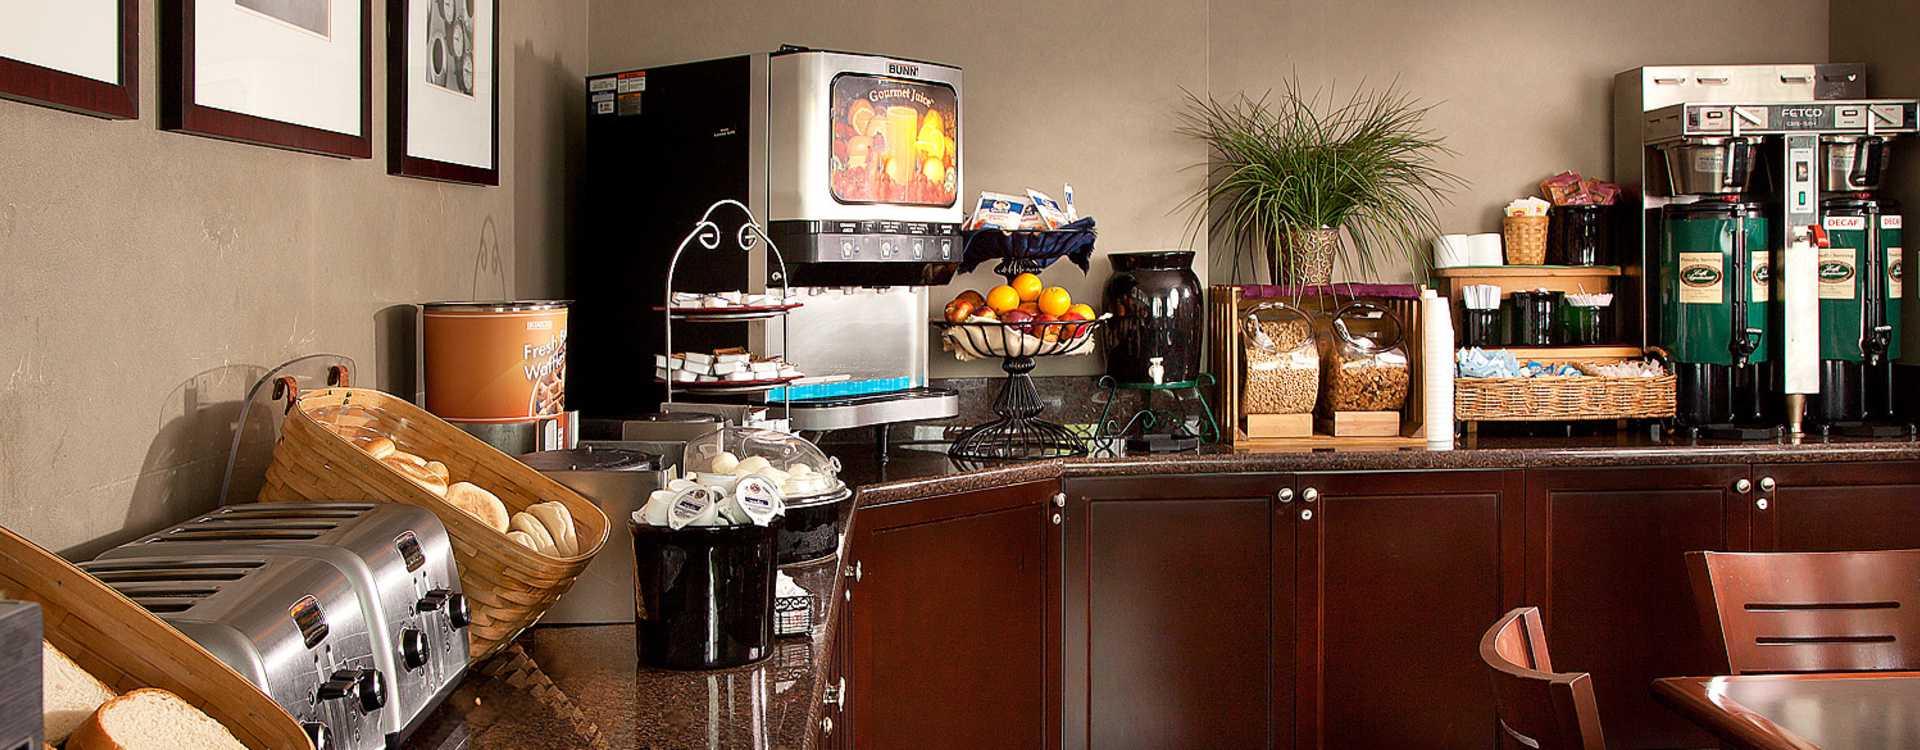 Coast Gateway Hotel Breakfast Room